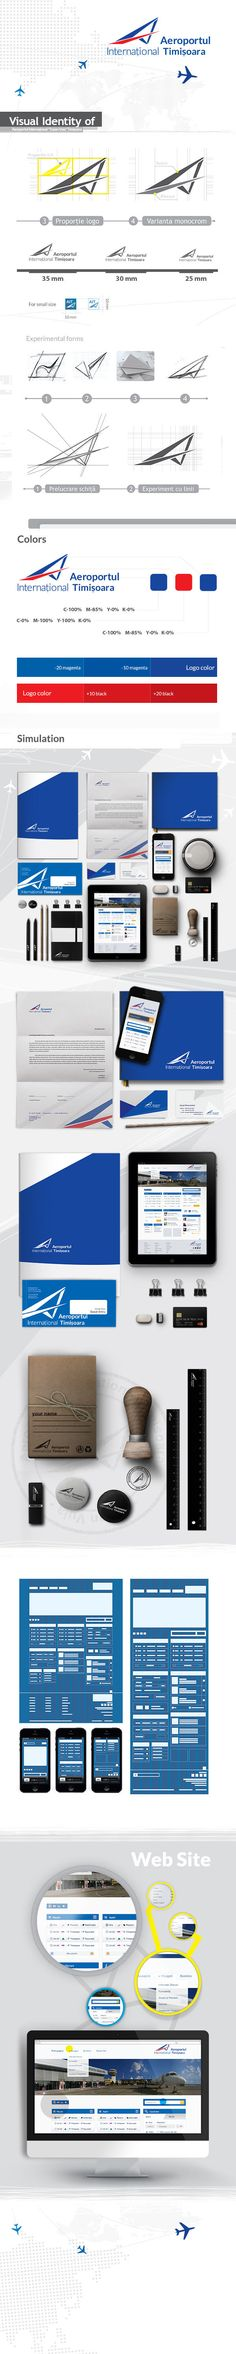 Visual Identity of Timisoara International Airport by Gusat Silviu, via Behance